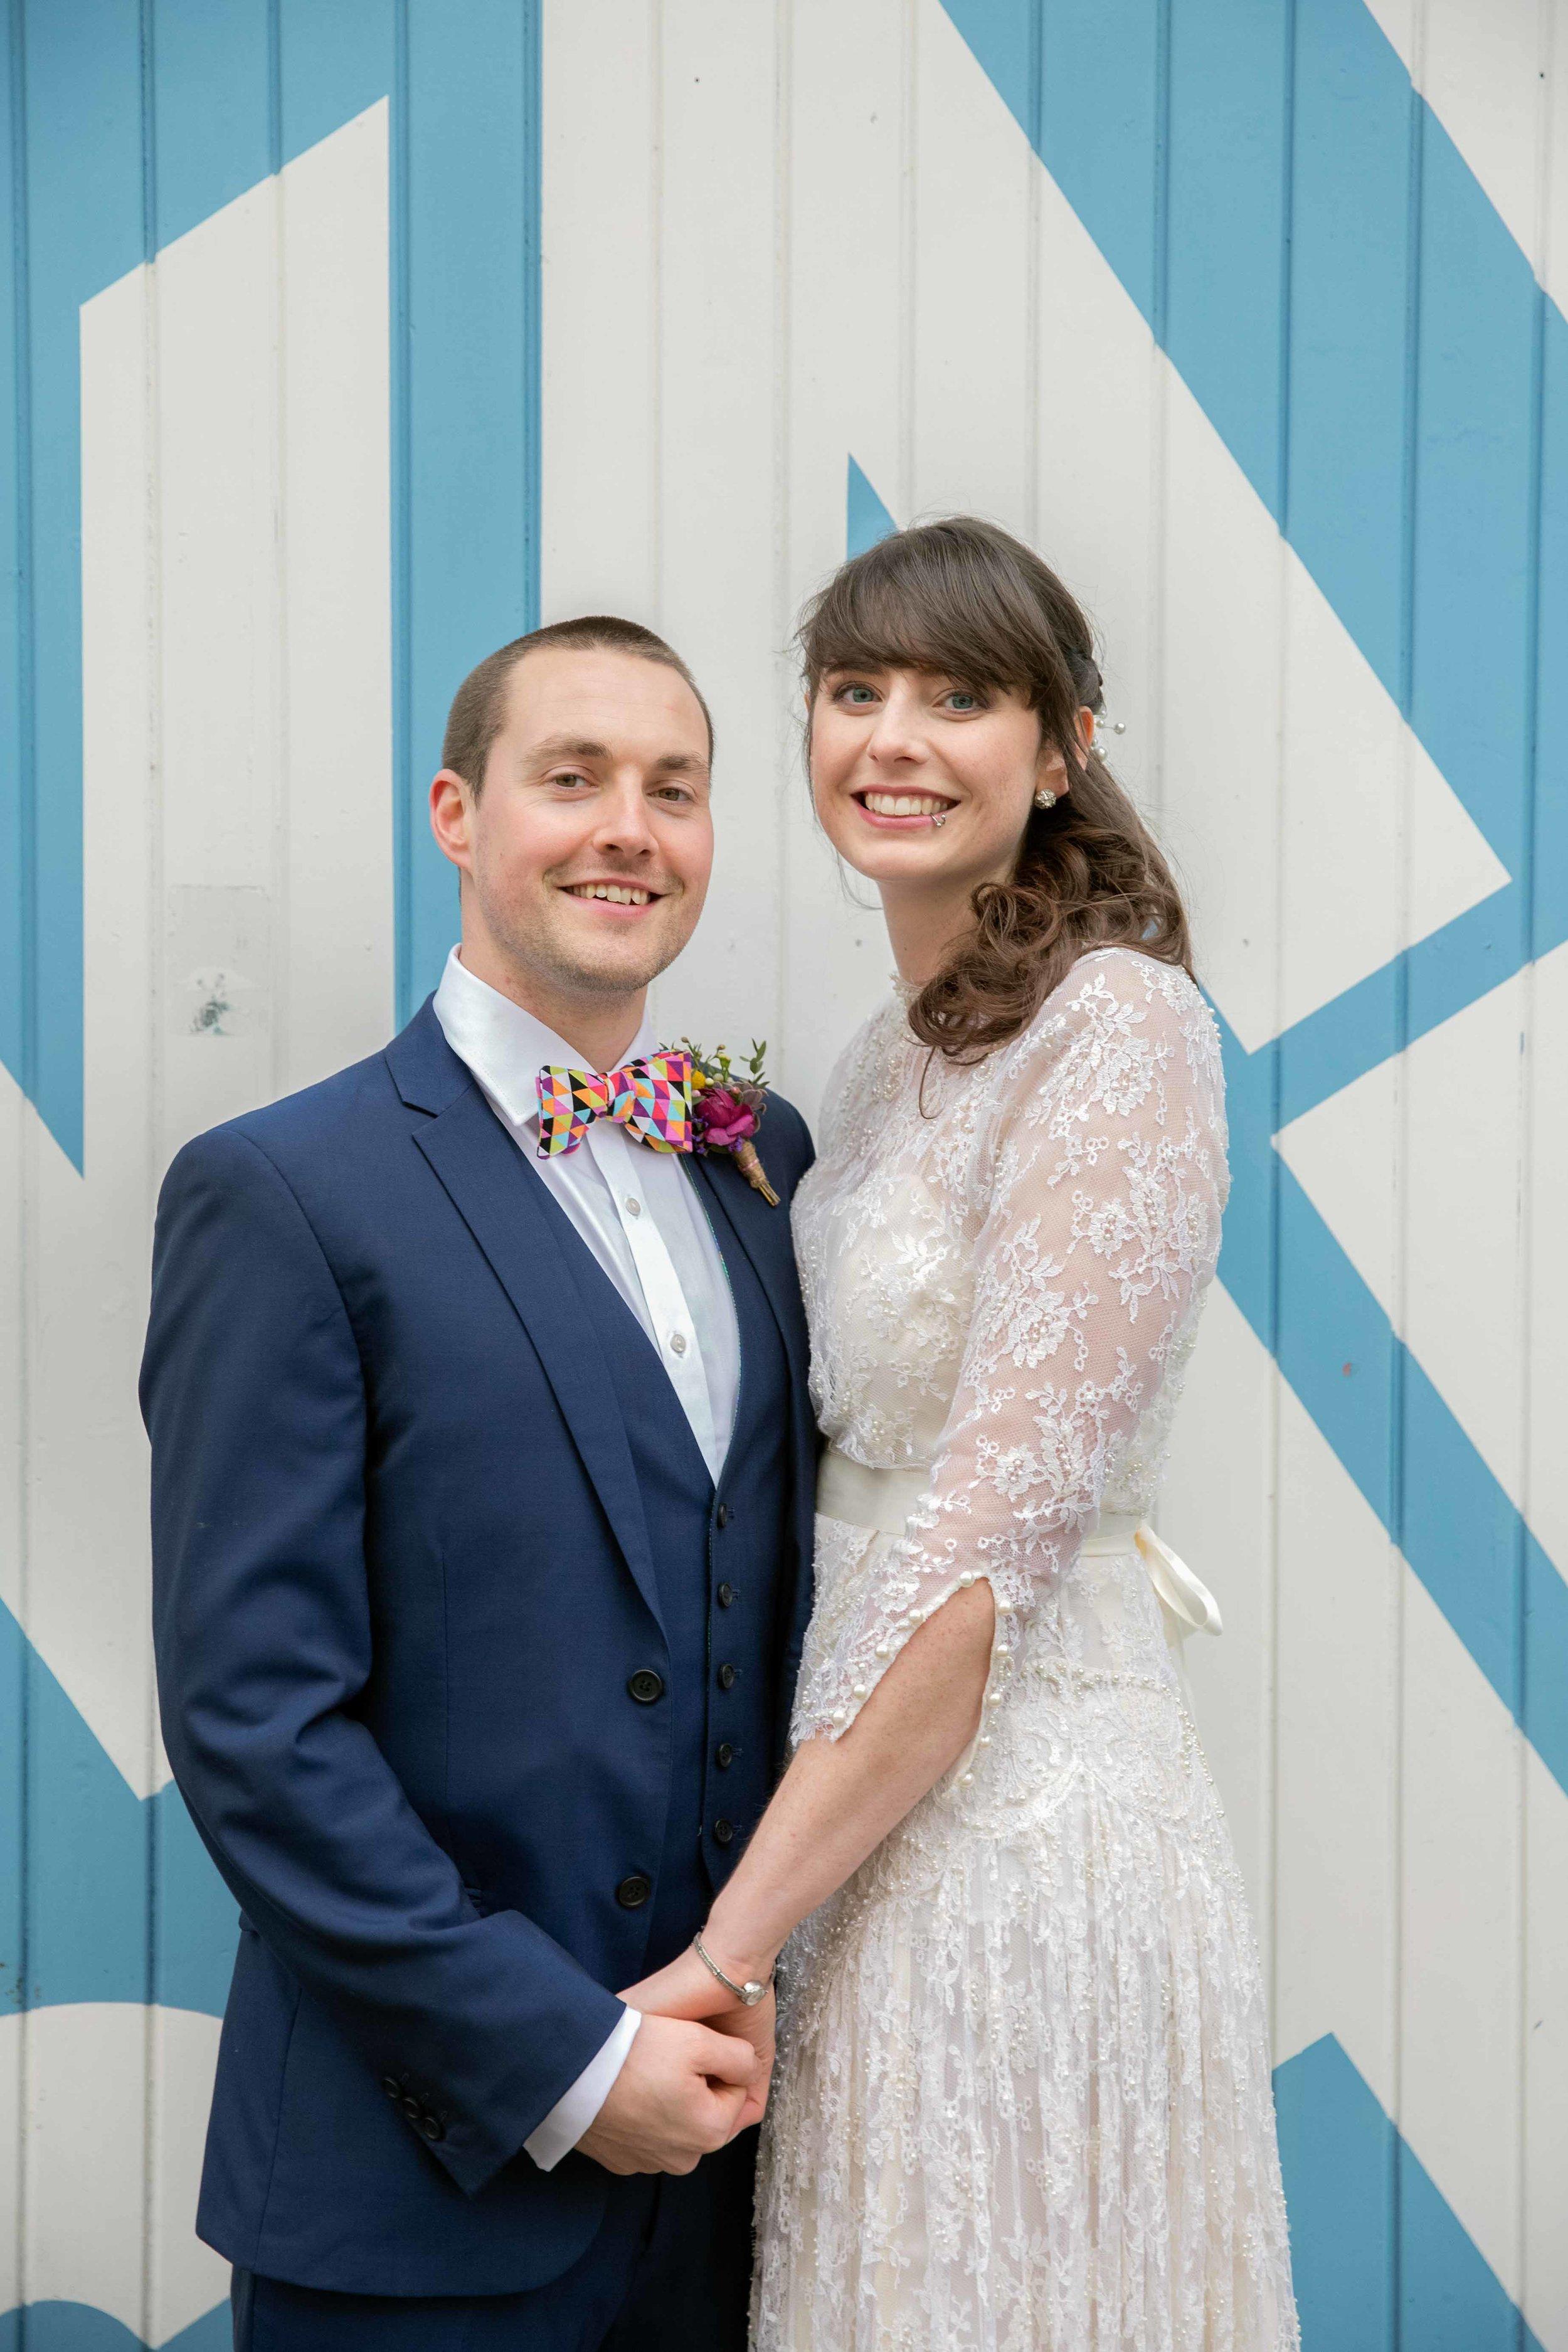 Adam & Faye - Wright Wedding Photography - Bristol Wedding Photographer -257.jpg